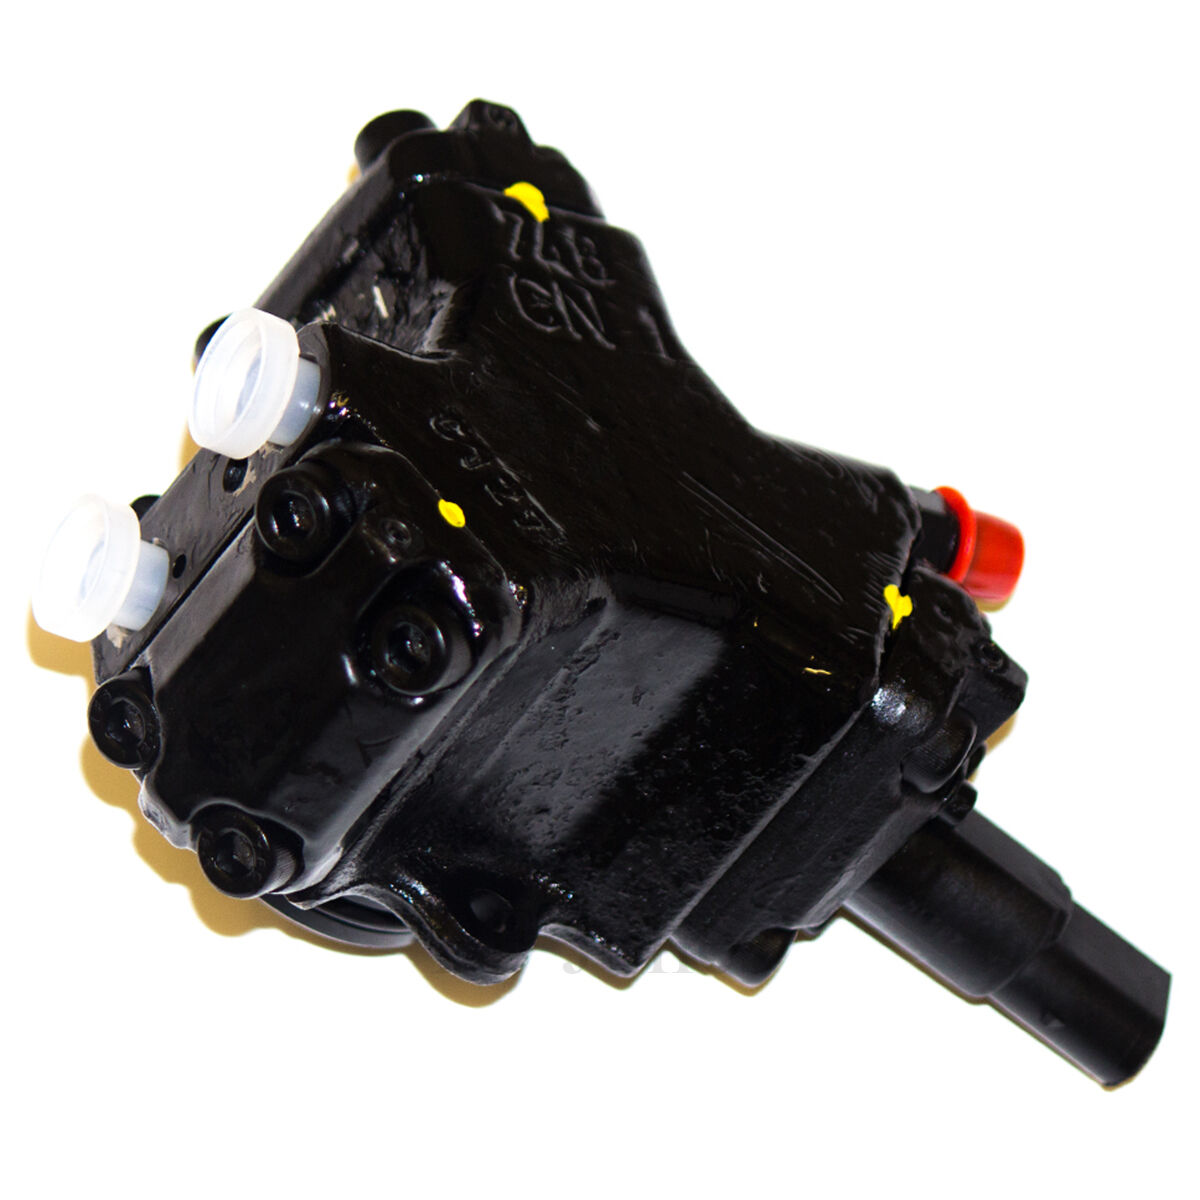 Fuel Injection Pump A6110700701 0445010024 MERCEDES SPRINTER CDI REMAN pump